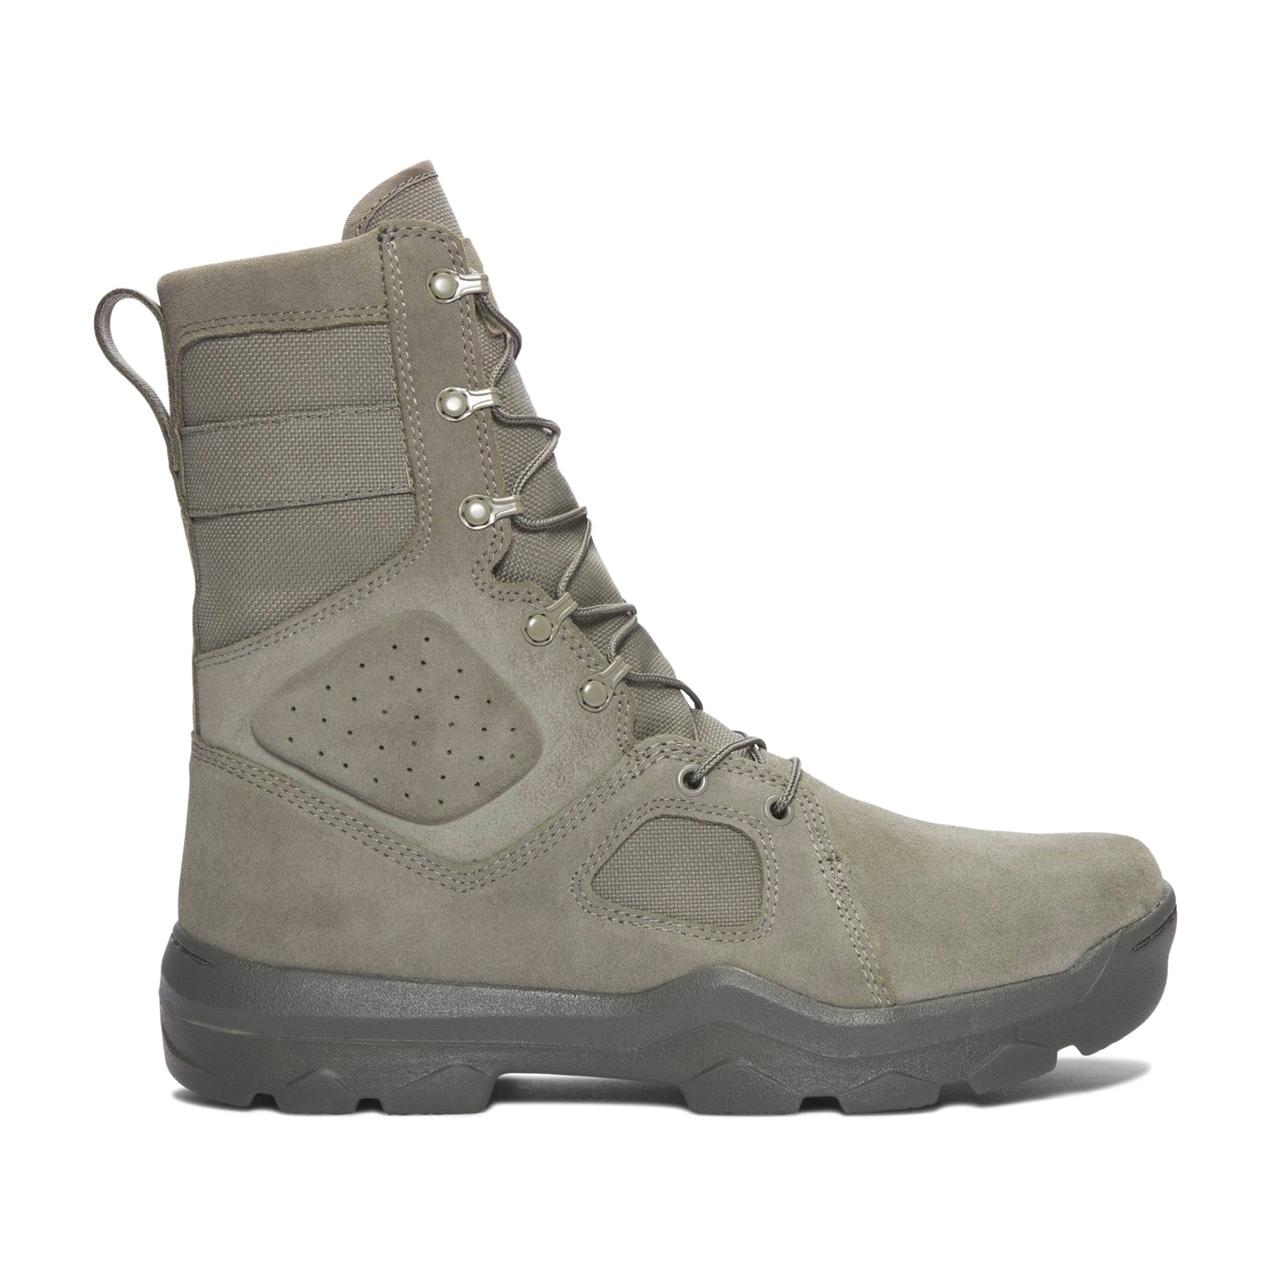 2c9fe14f50f Under Armour 1287352 Men's FNP Tactical Boots